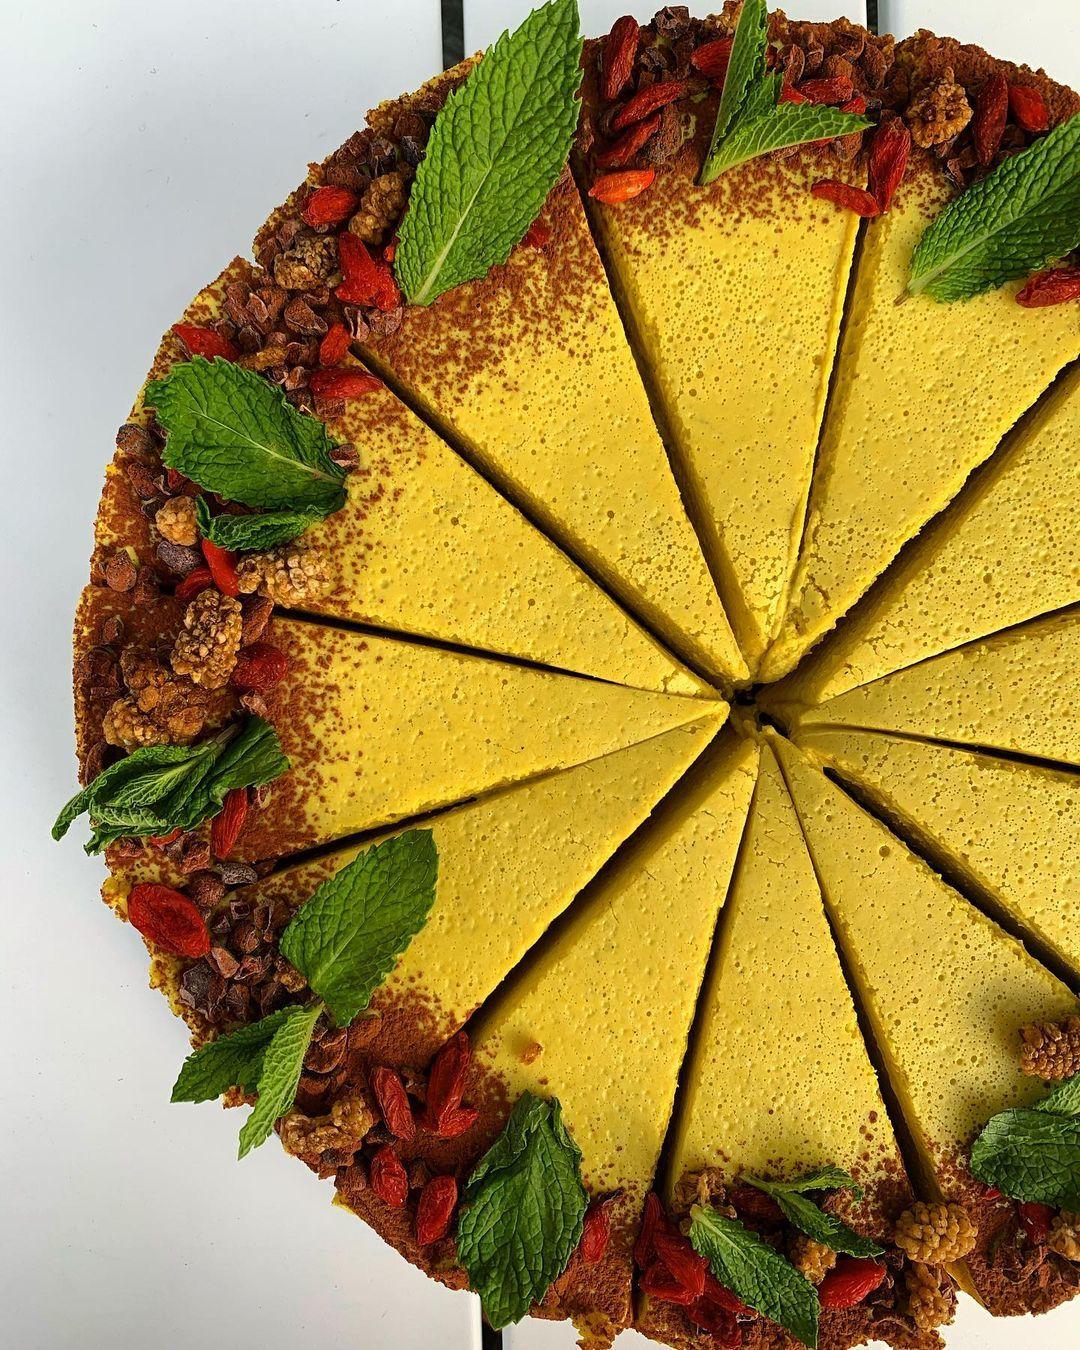 vegan-cheesecake-elements-real-food